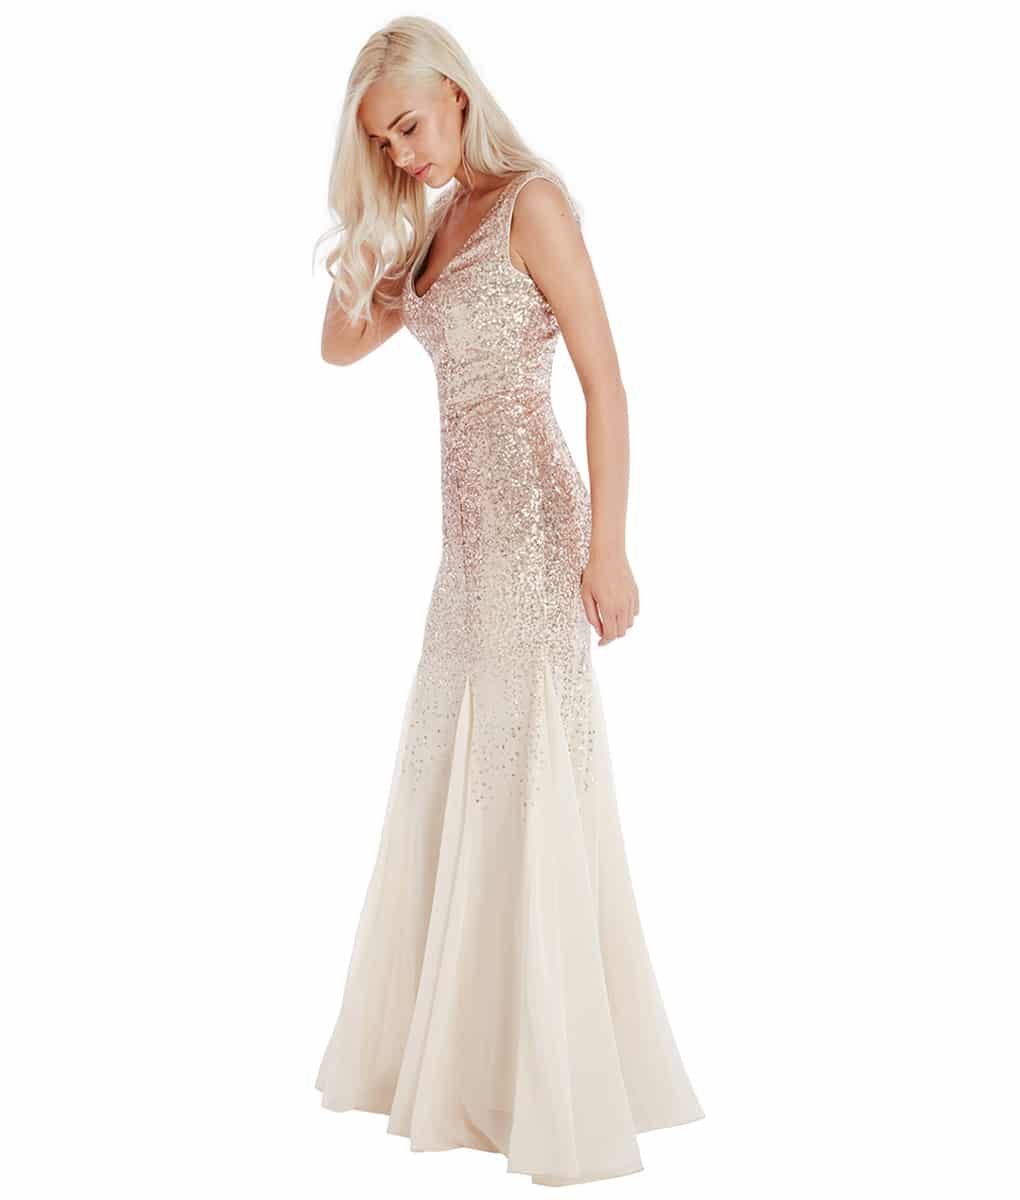 Alila-Champagne-v-neck-sequin-debs-dress-City-Goddess-front